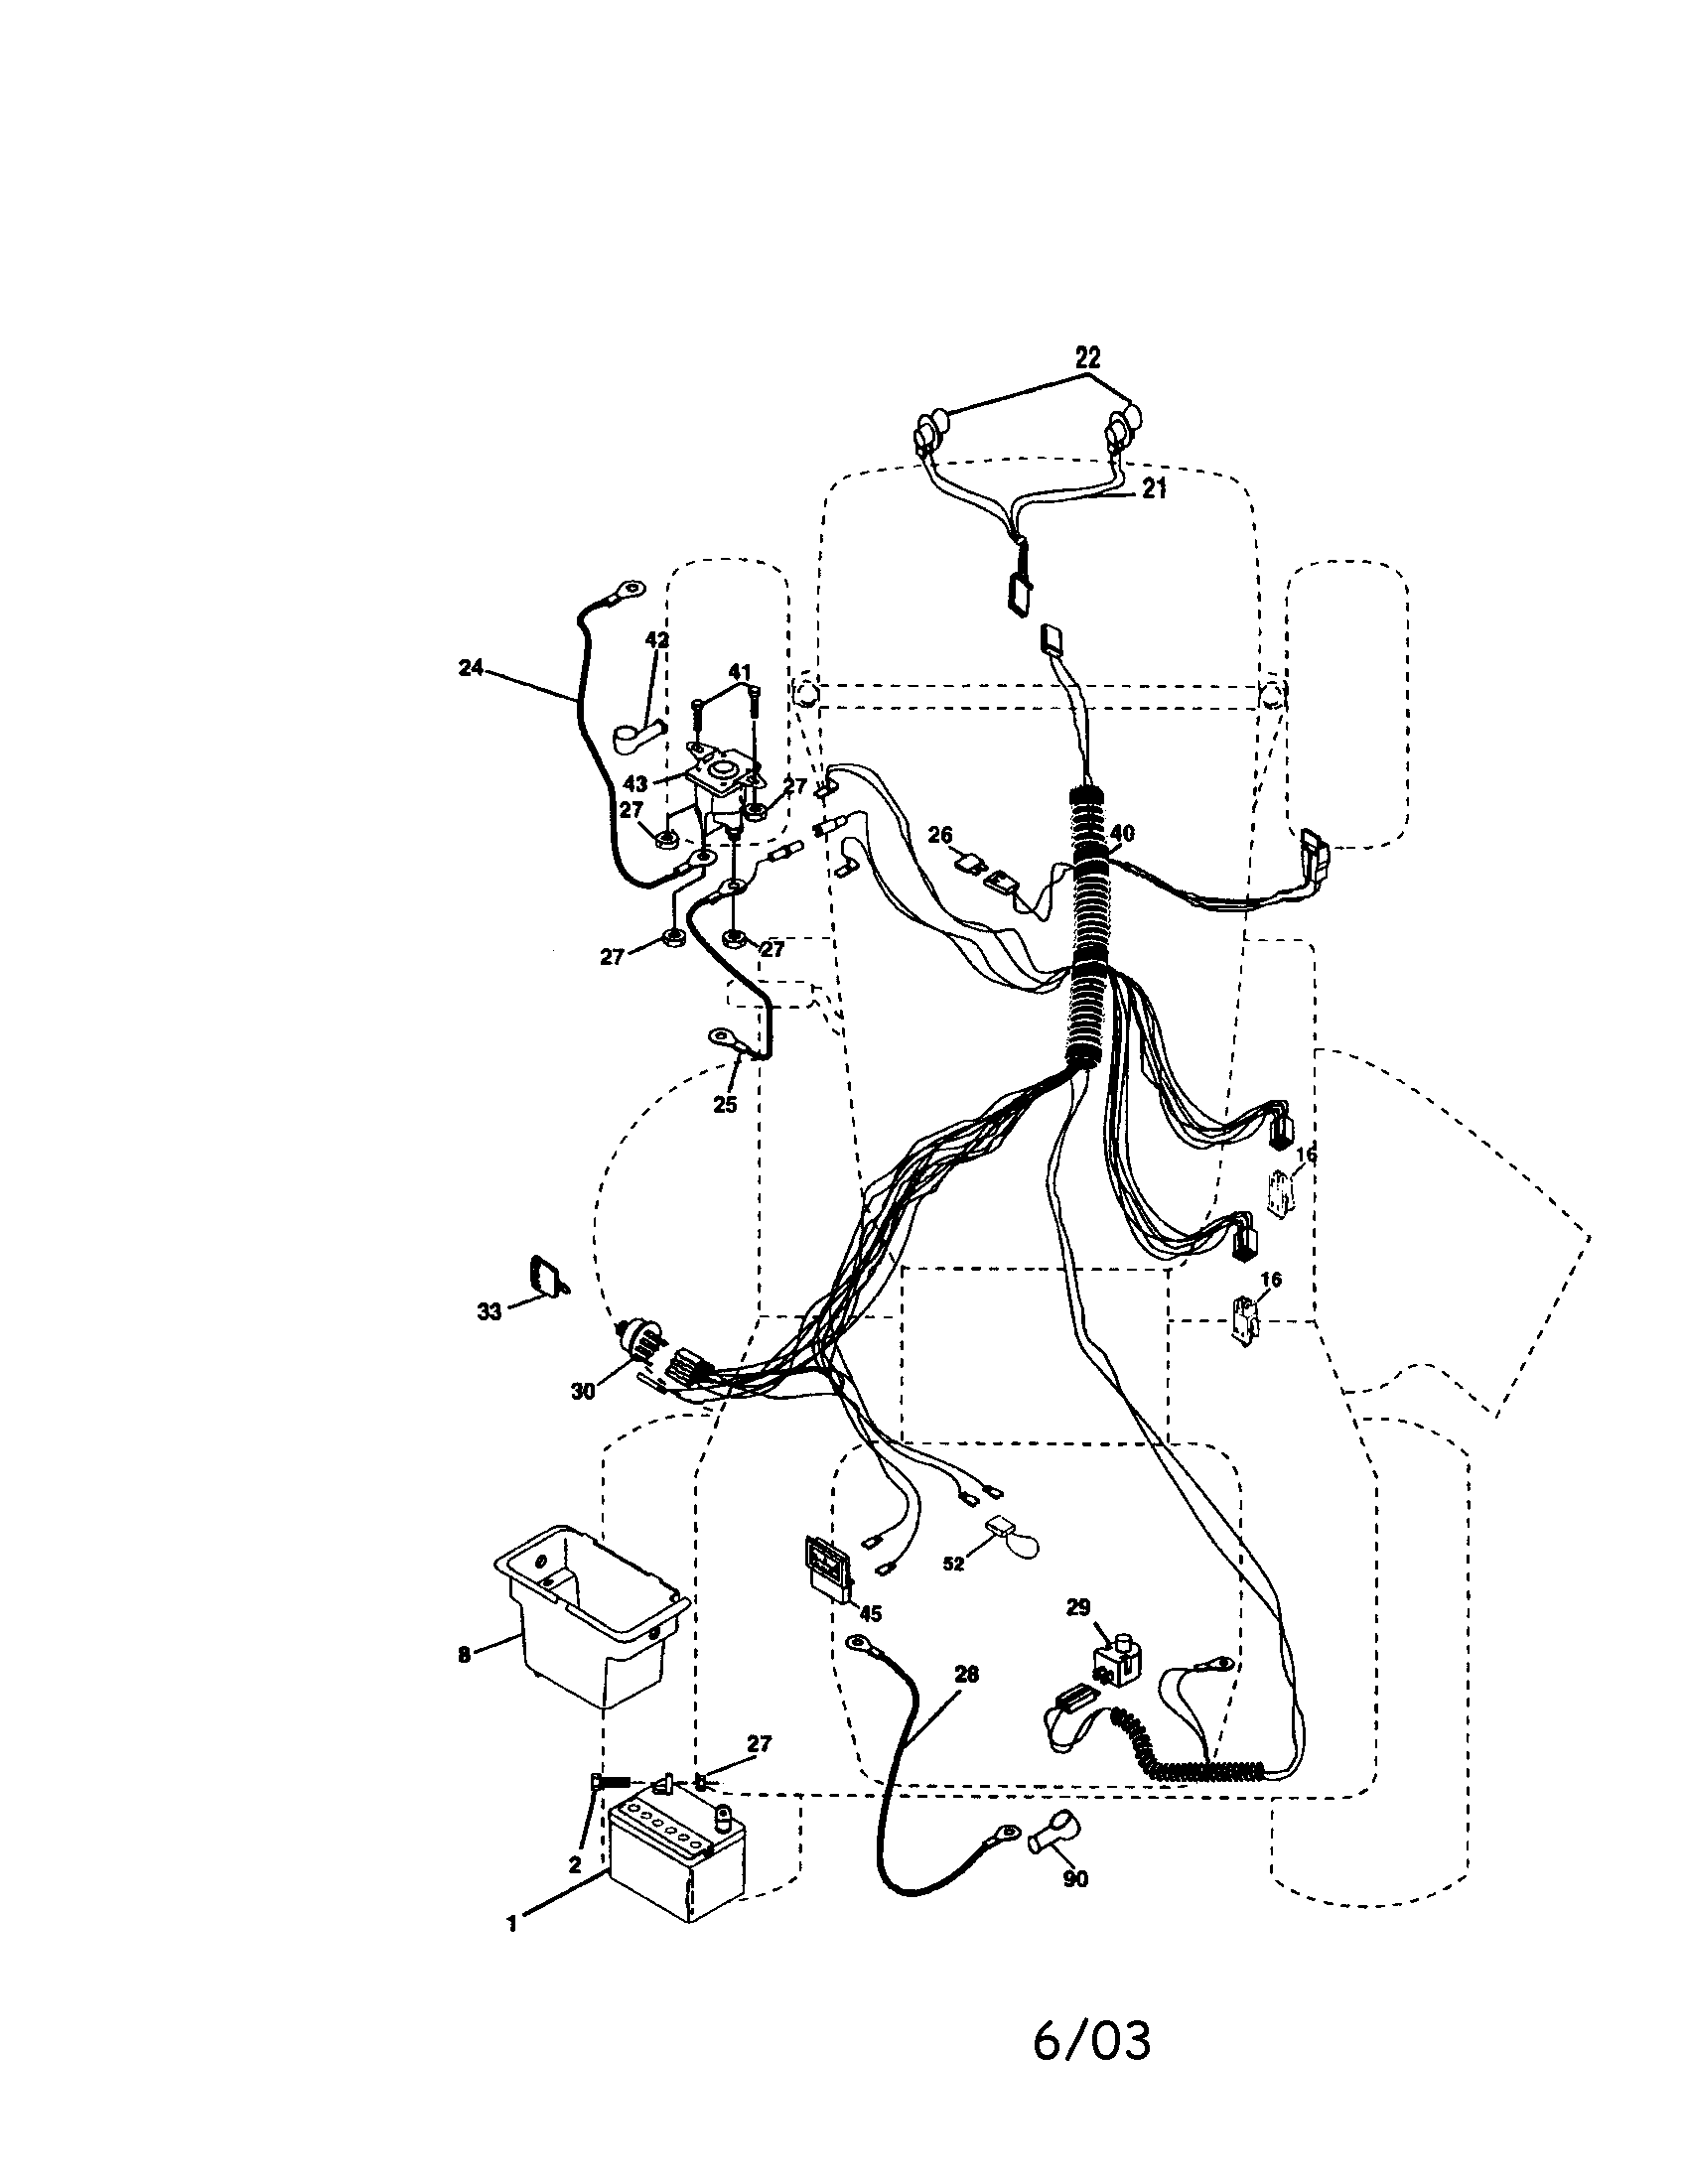 Magnificent lawn mower carburetor diagram briggs and stratton